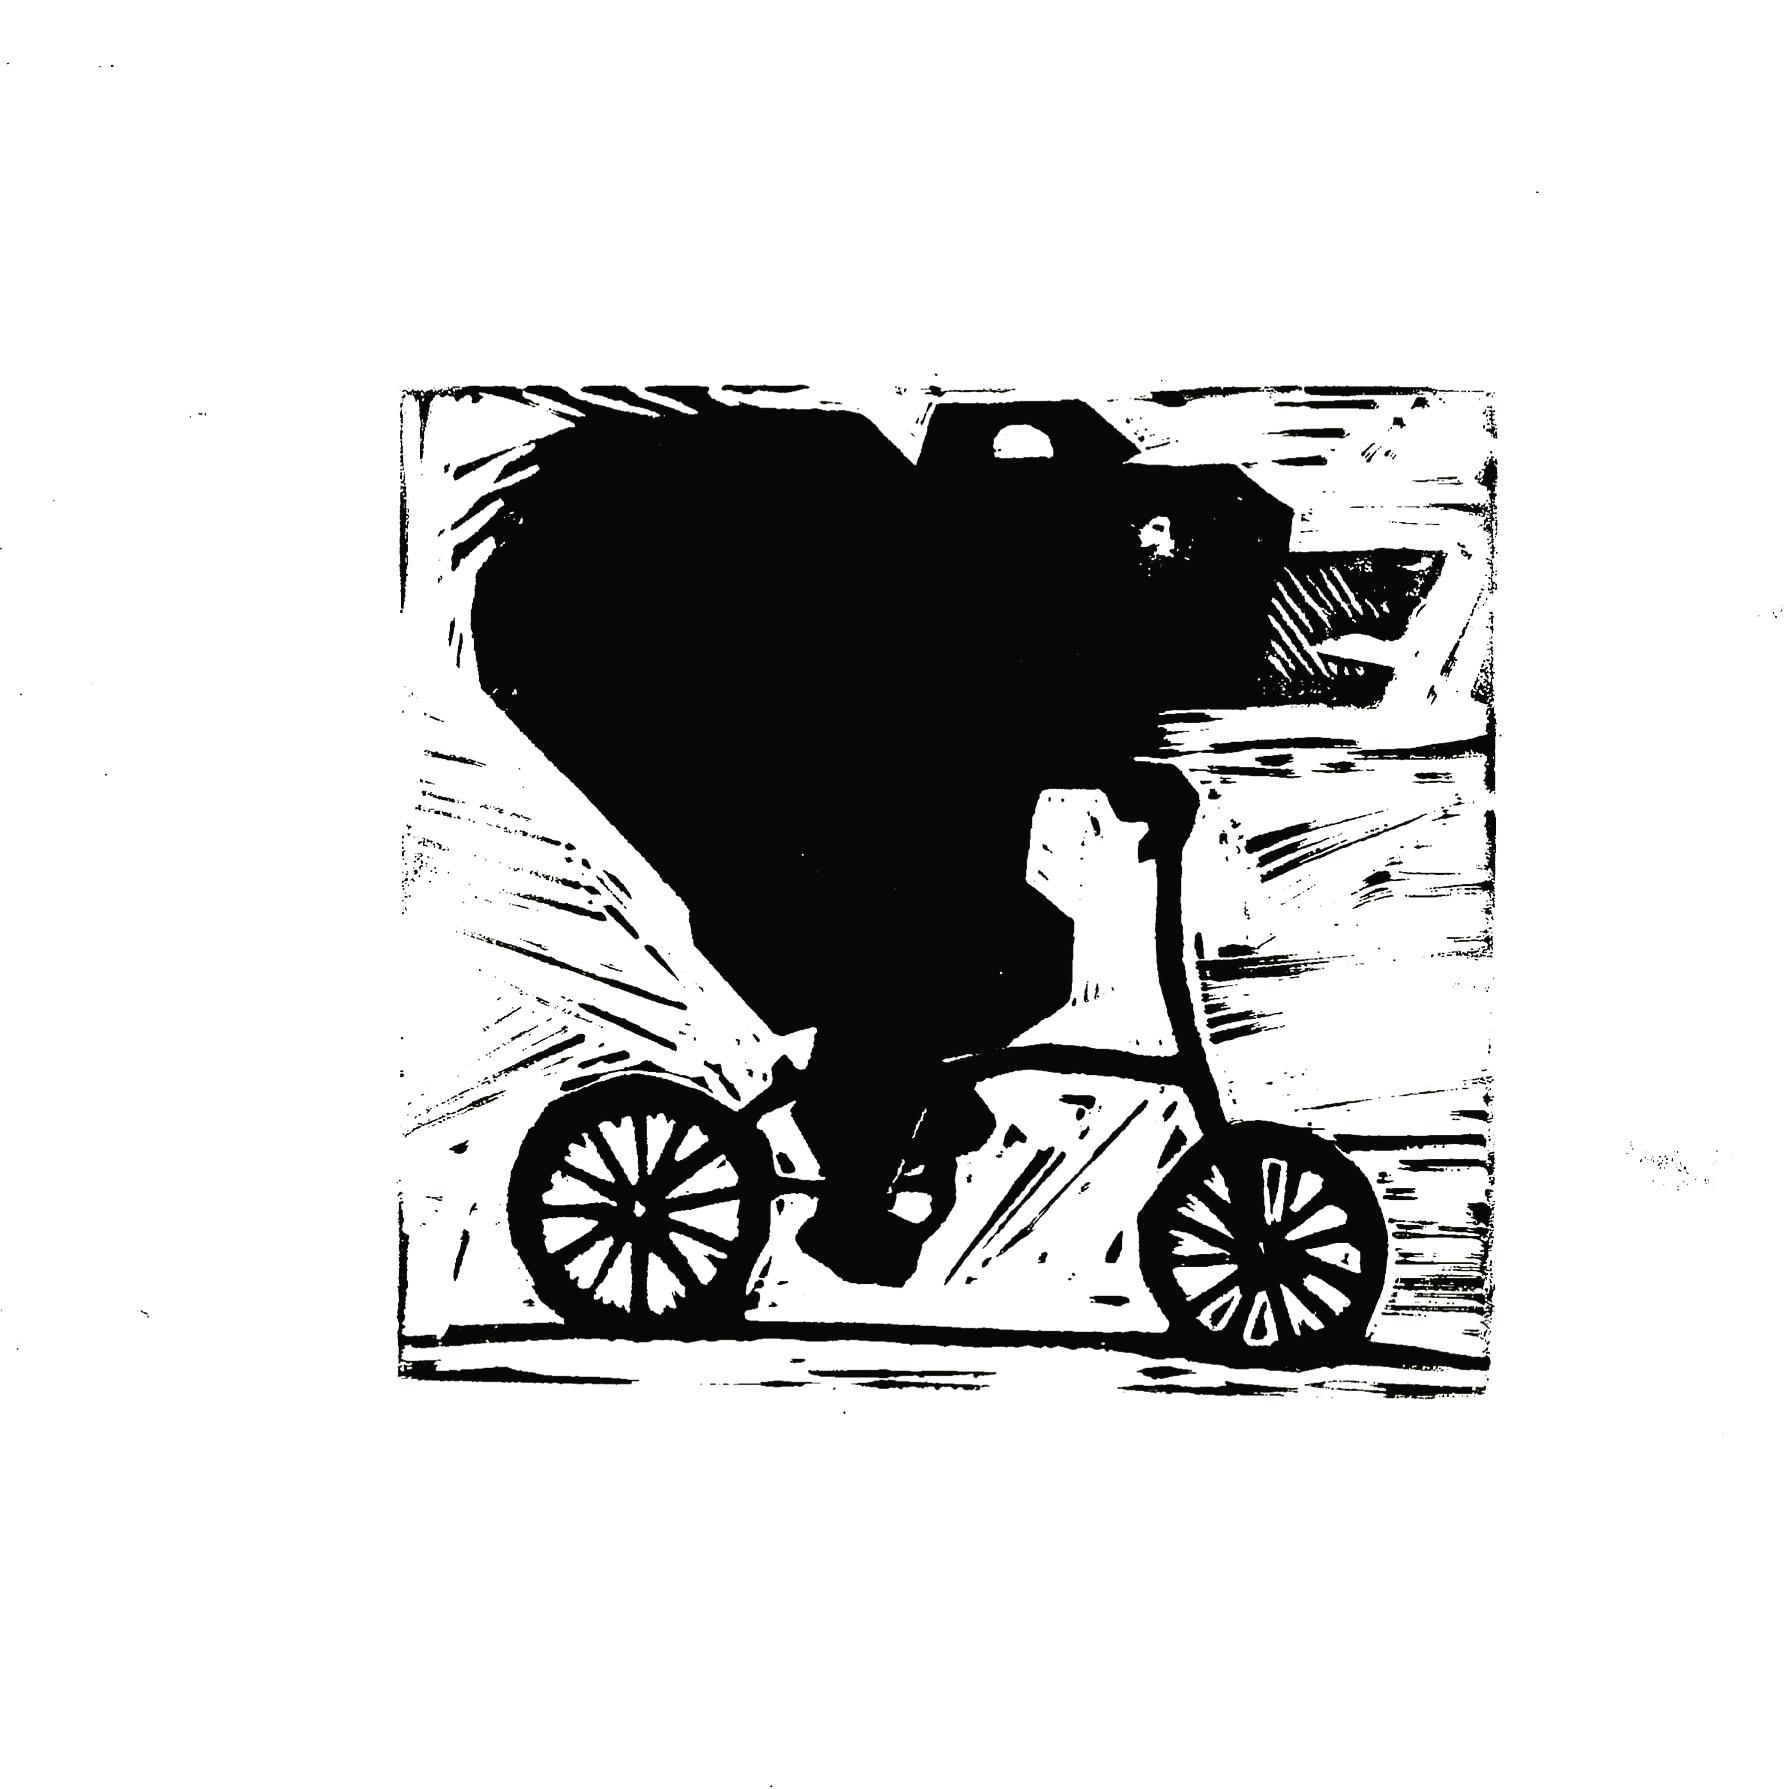 Lino print on White paper